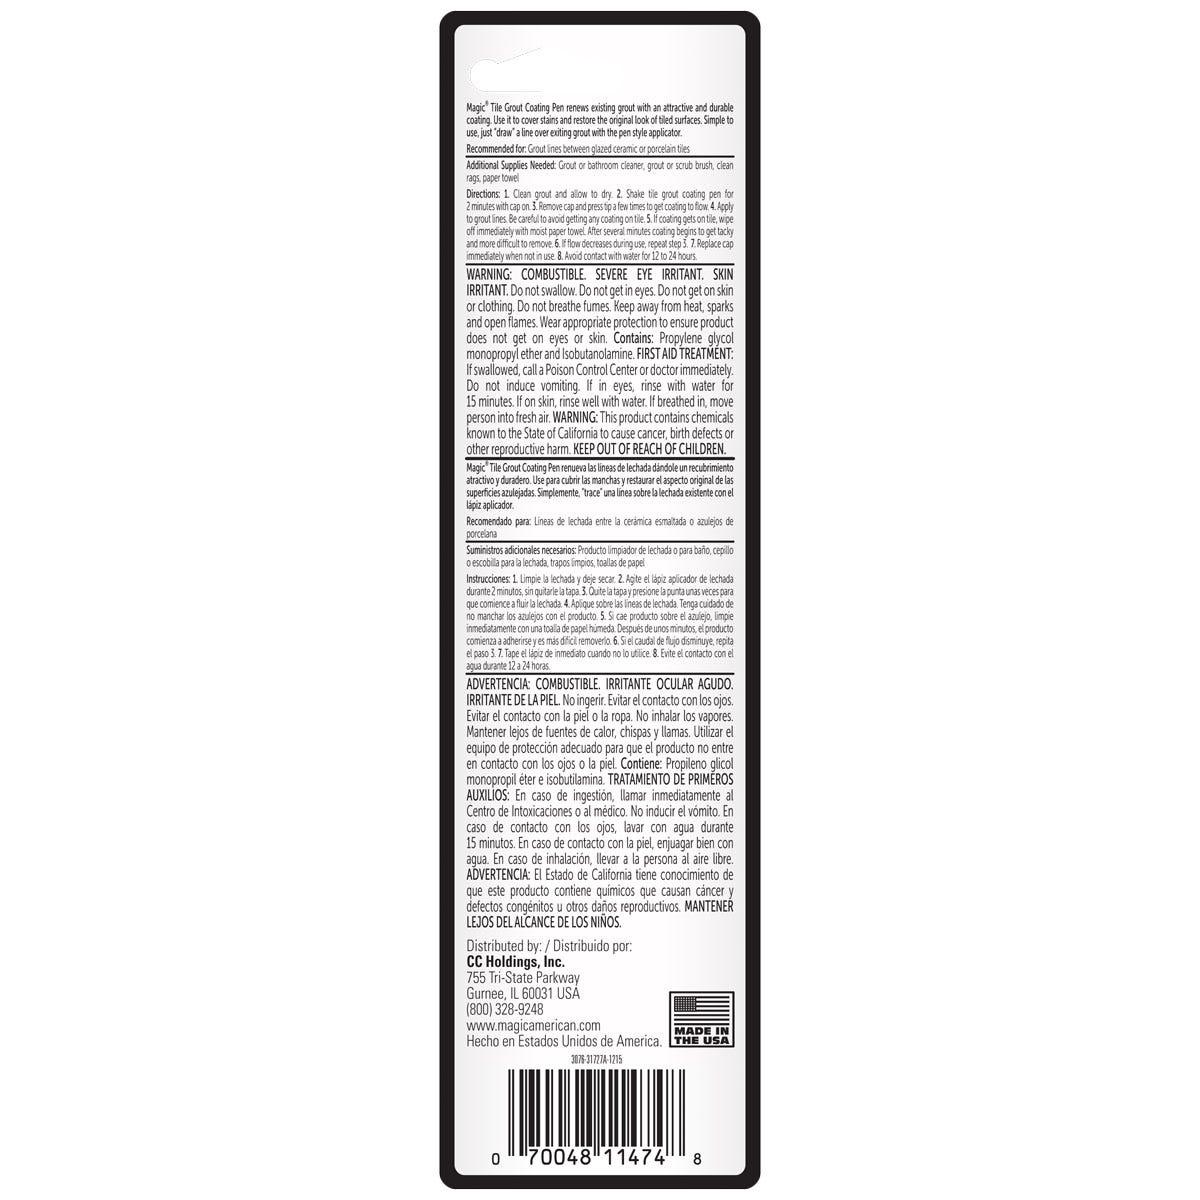 https://googone.com/media/catalog/product/m/a/magic-grout-coating-pen_back.jpg